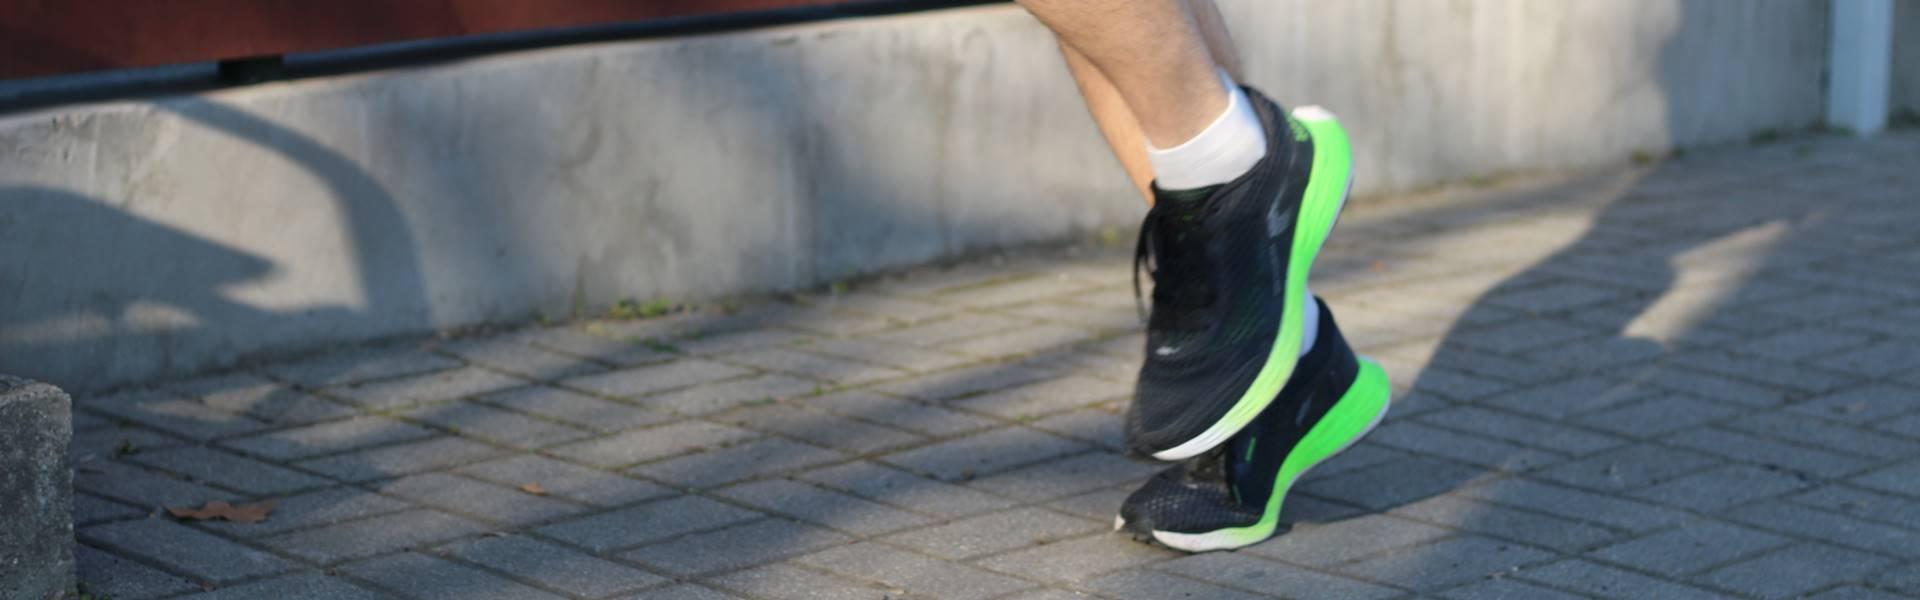 Kiprun KD 500 futócipő teszt